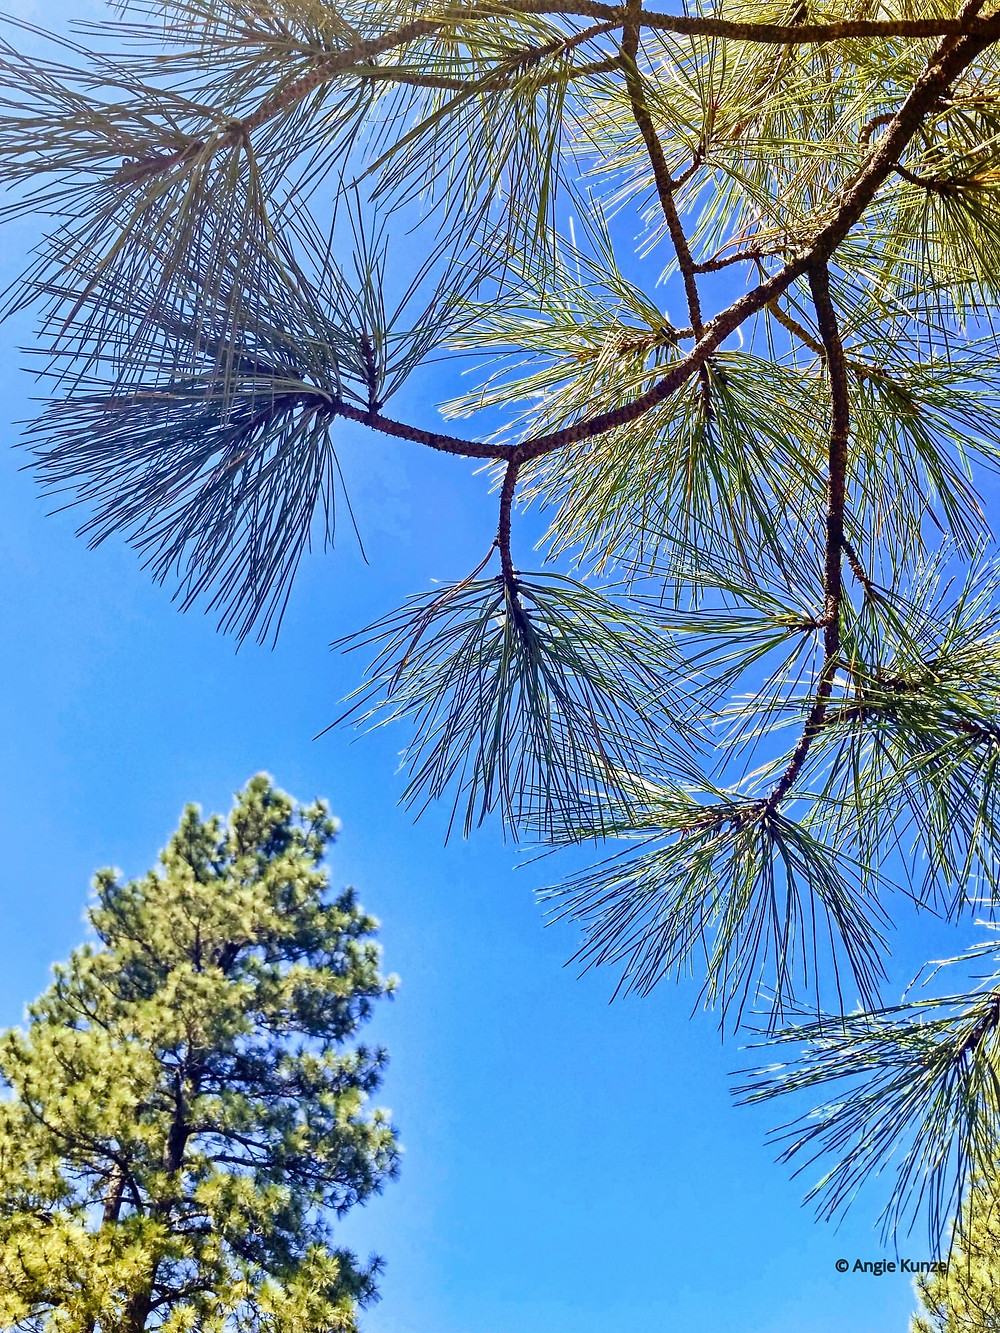 Pine trees in Flagstaff Arizona